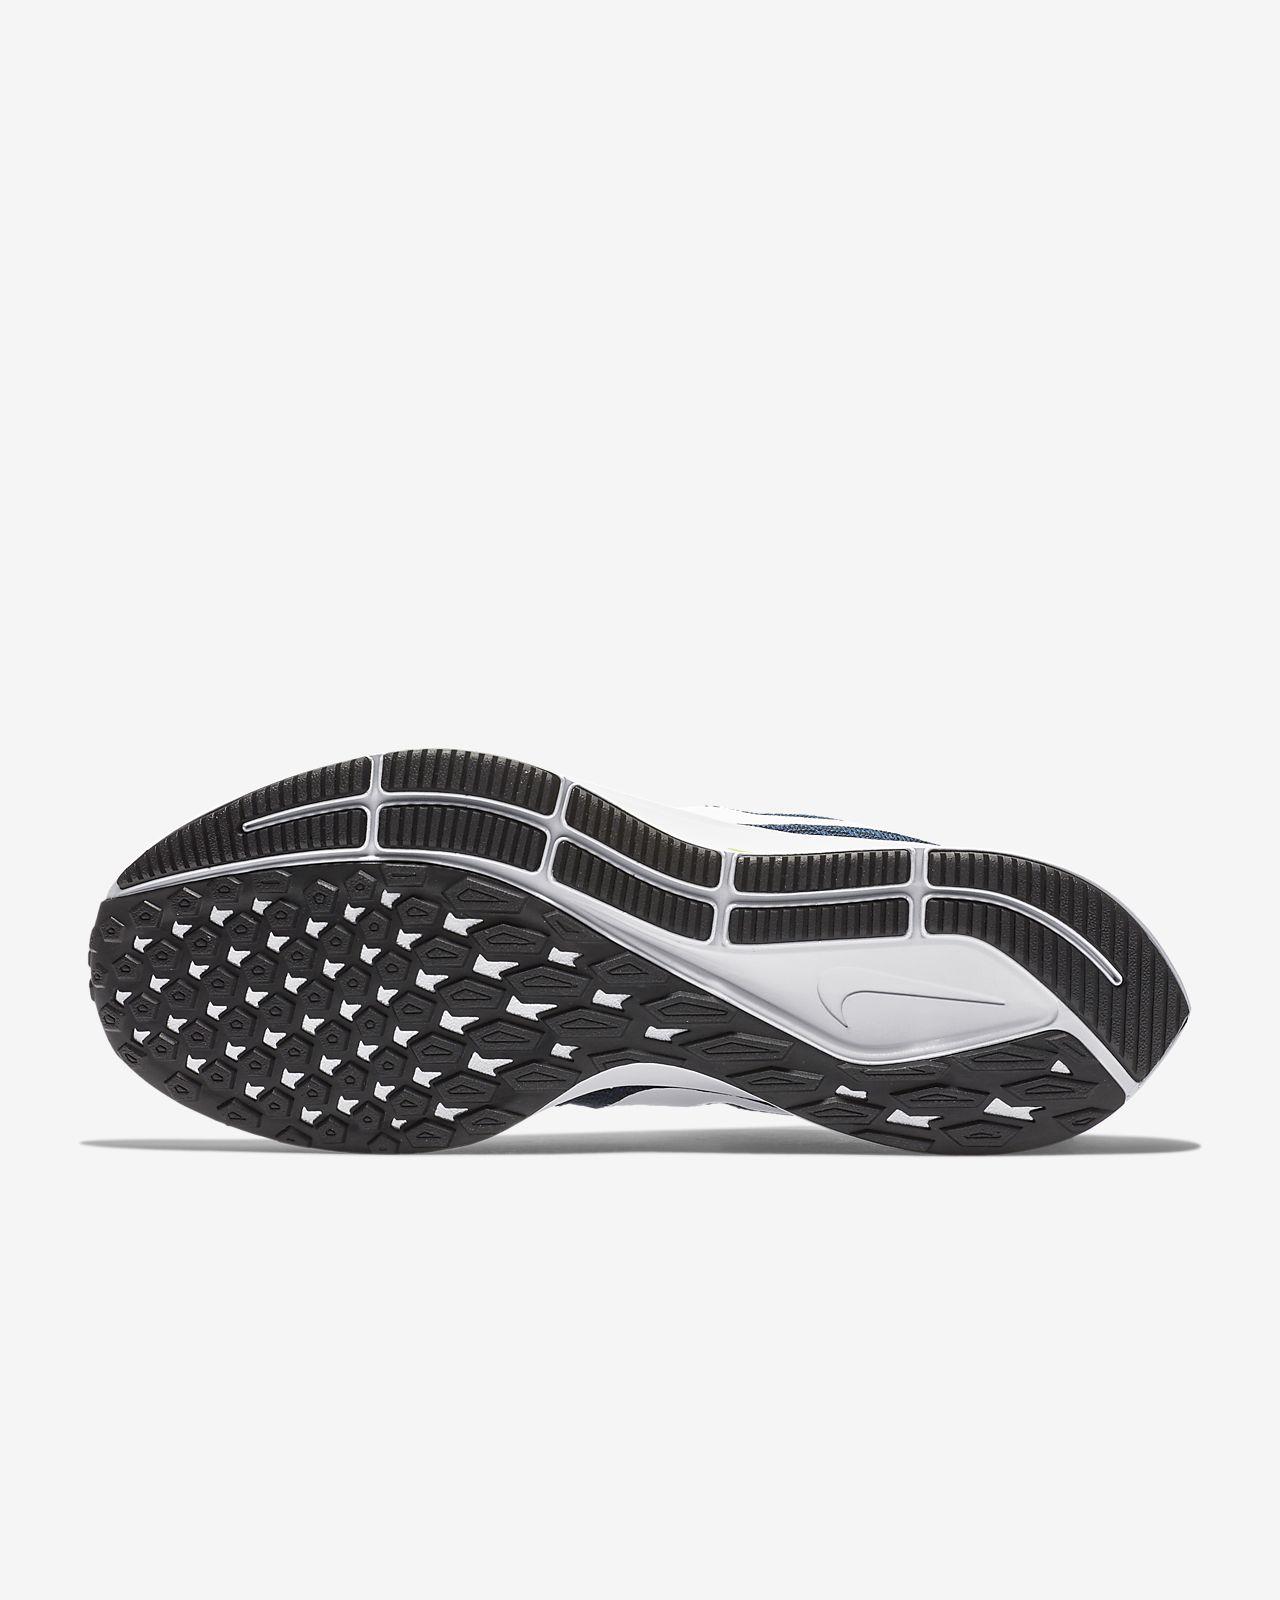 d1948e8cb4ae1 Nike Air Zoom Pegasus 35 Men s Running Shoe. Nike.com CA